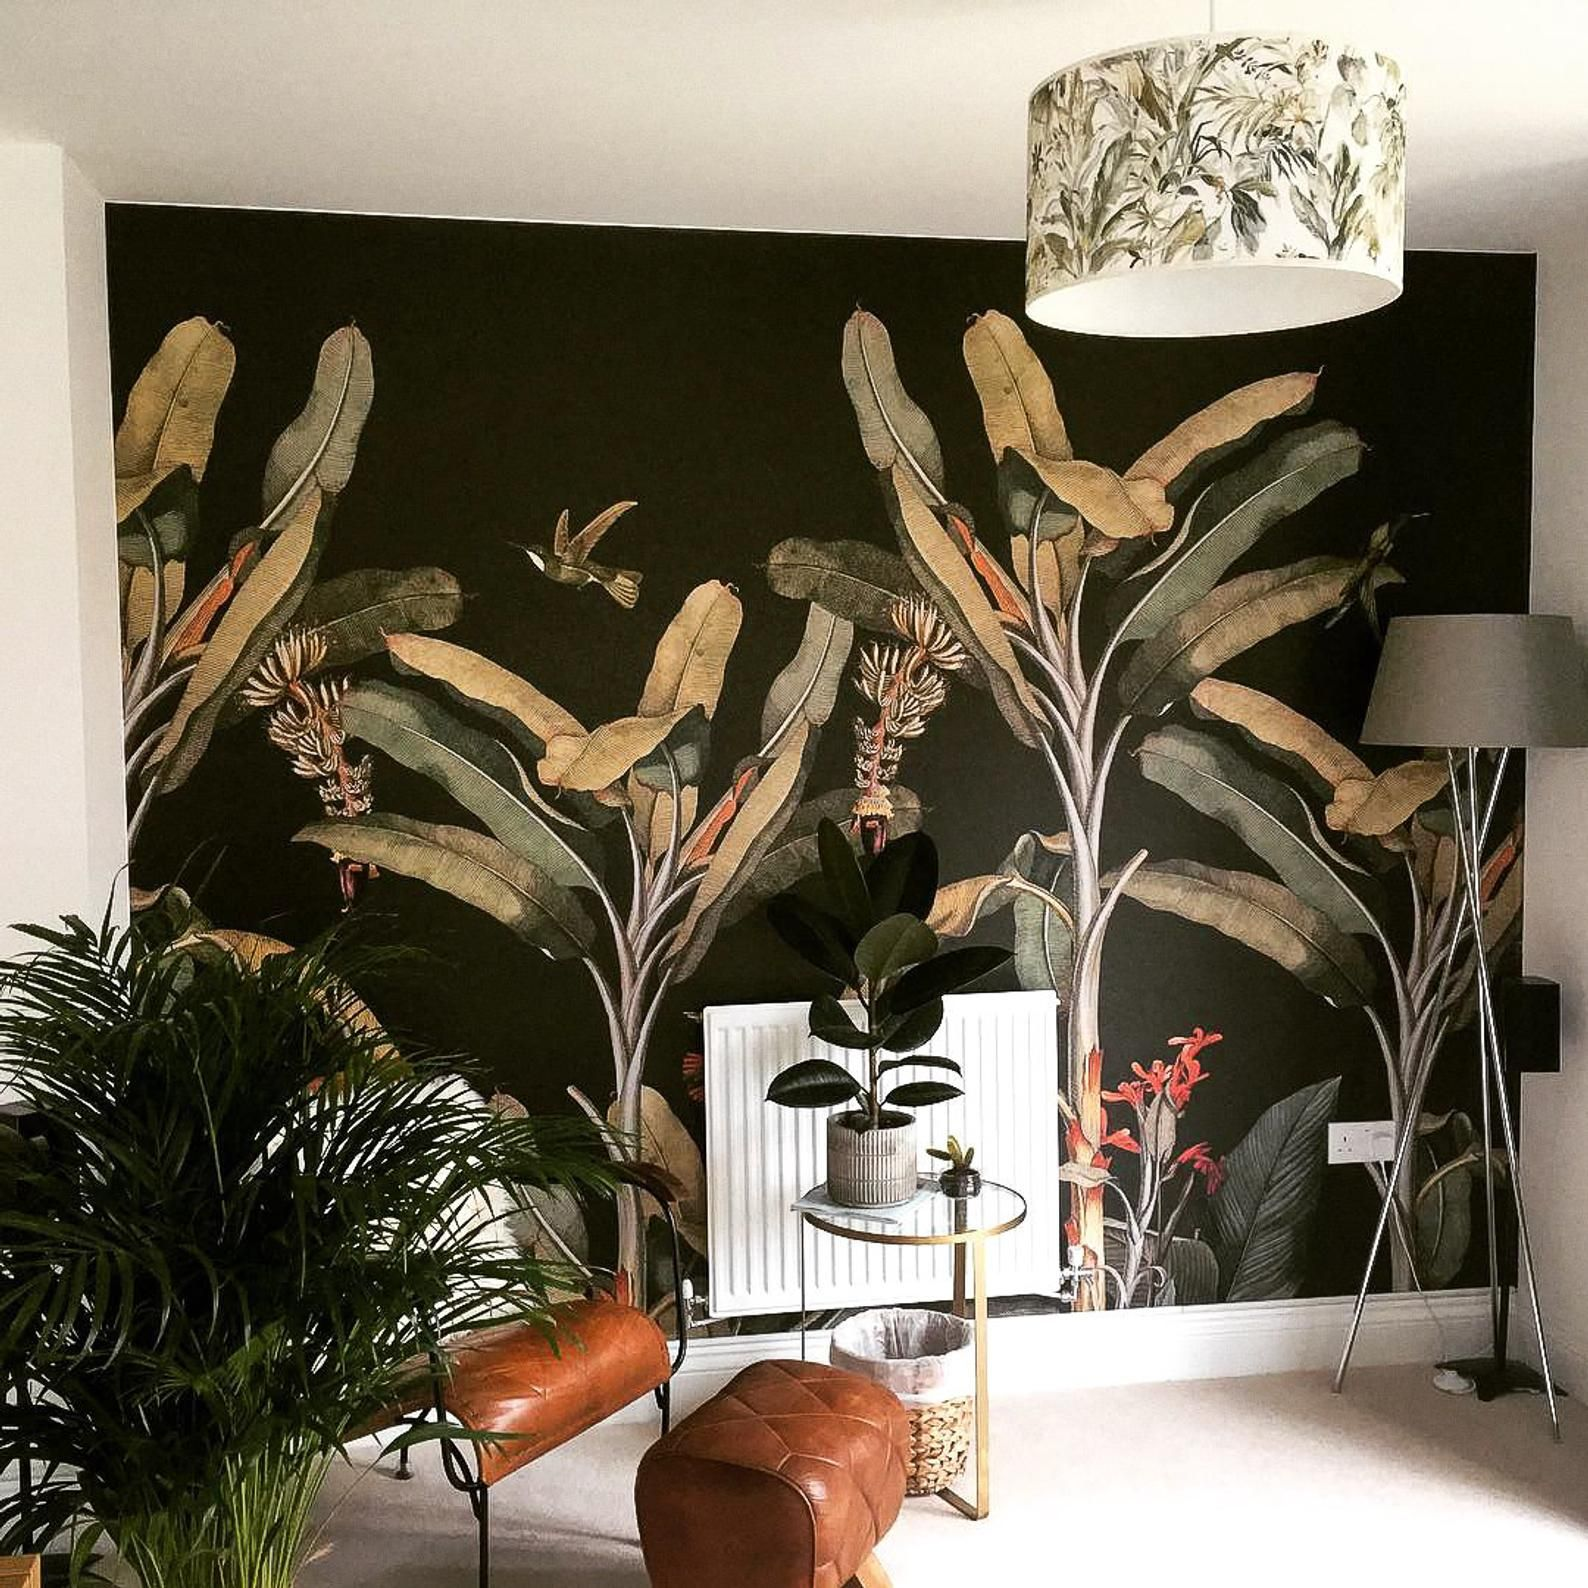 Dark palm tree removable wallpaper, Jungle wall mural